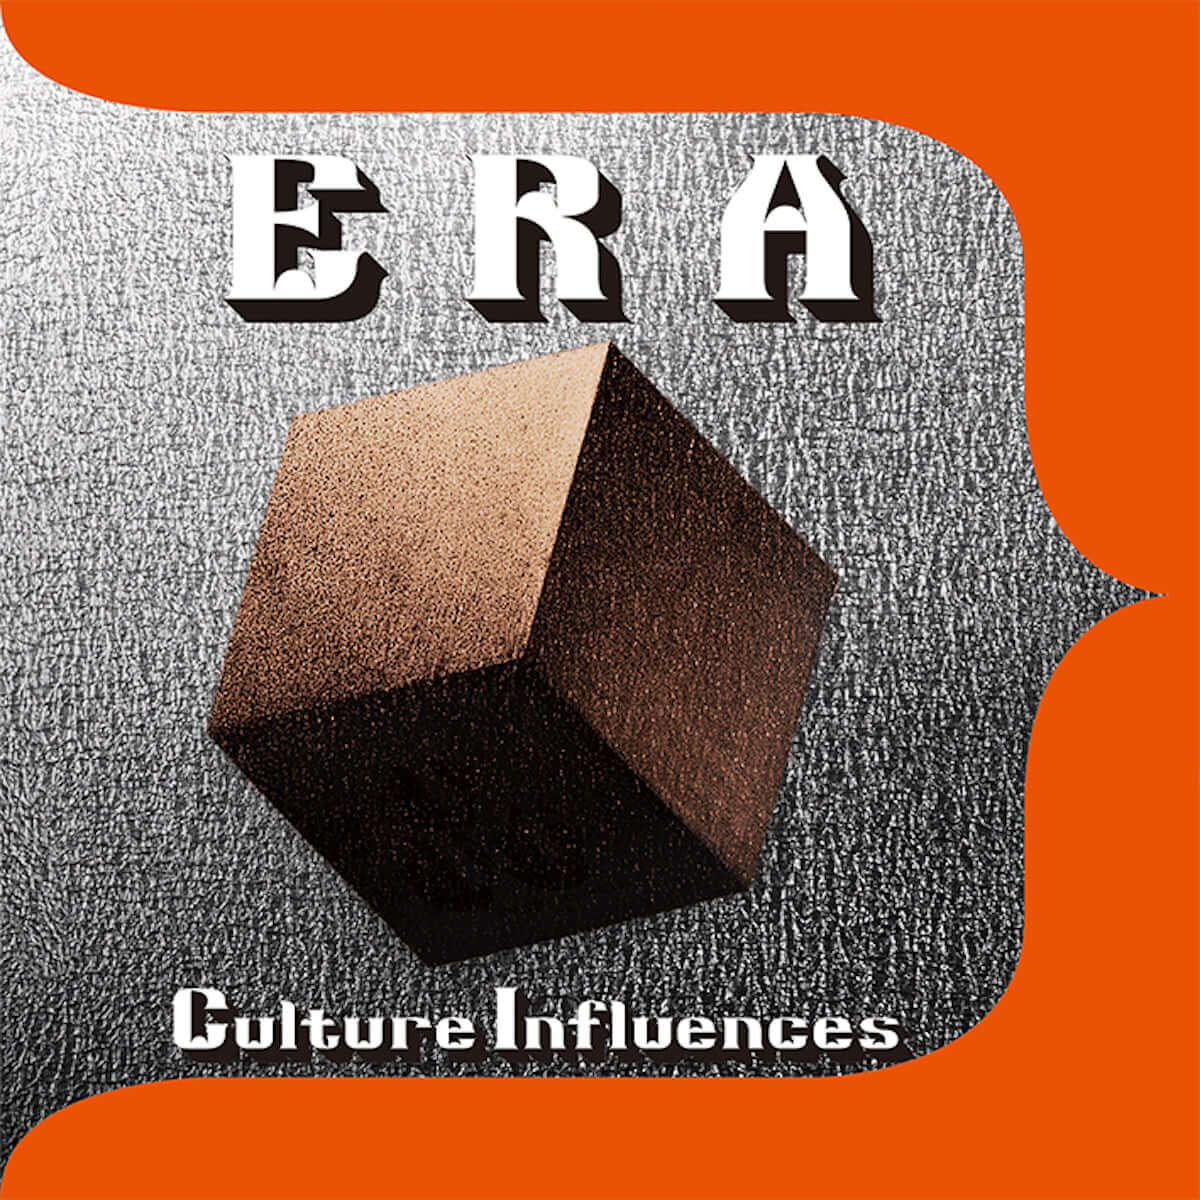 ERAが新作「Culture Influences」を9月26日にリリース|JJJやFEBB、VaVa、dooooらが参加 music180902-era-2-1200x1200